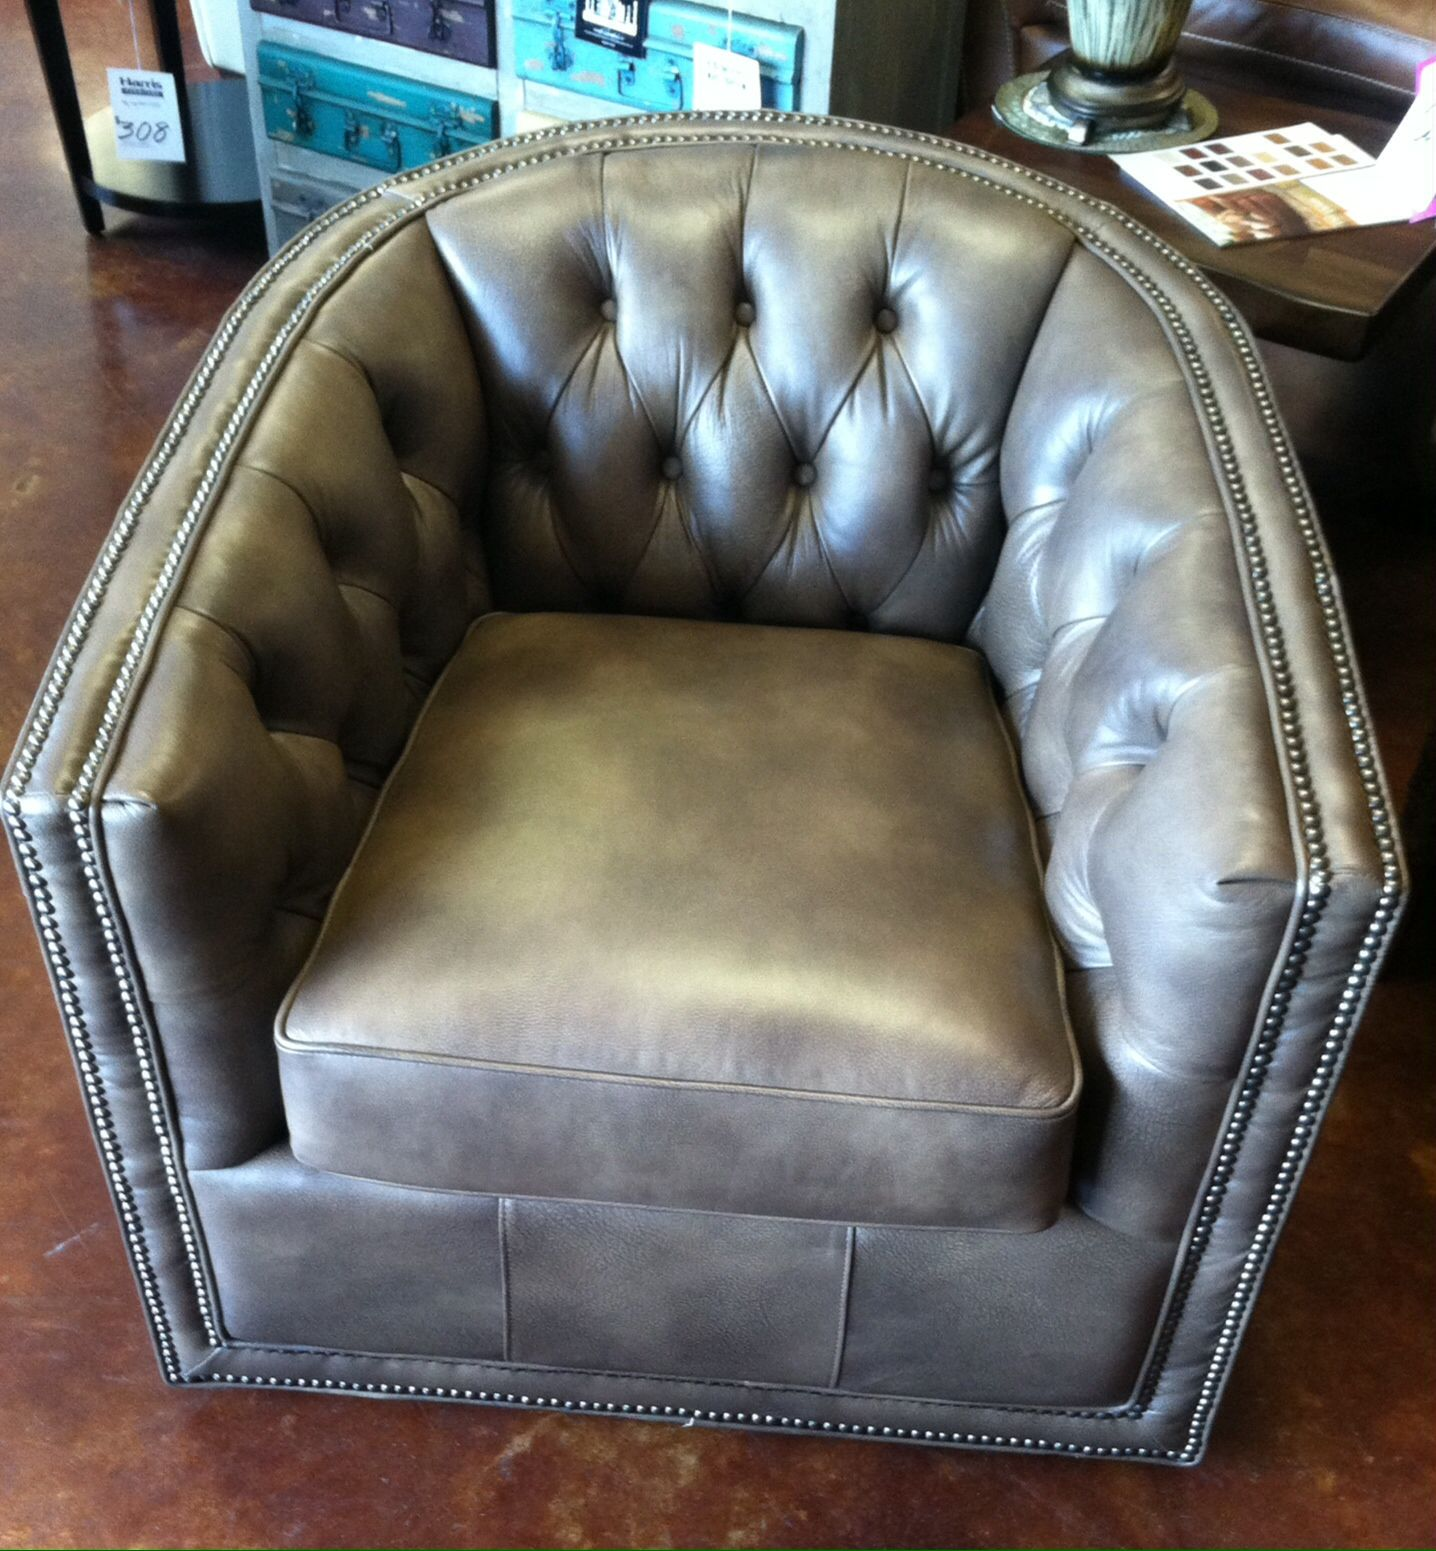 Leather Swivel Barrel Chair Desk Teal Flexsteel Store Images